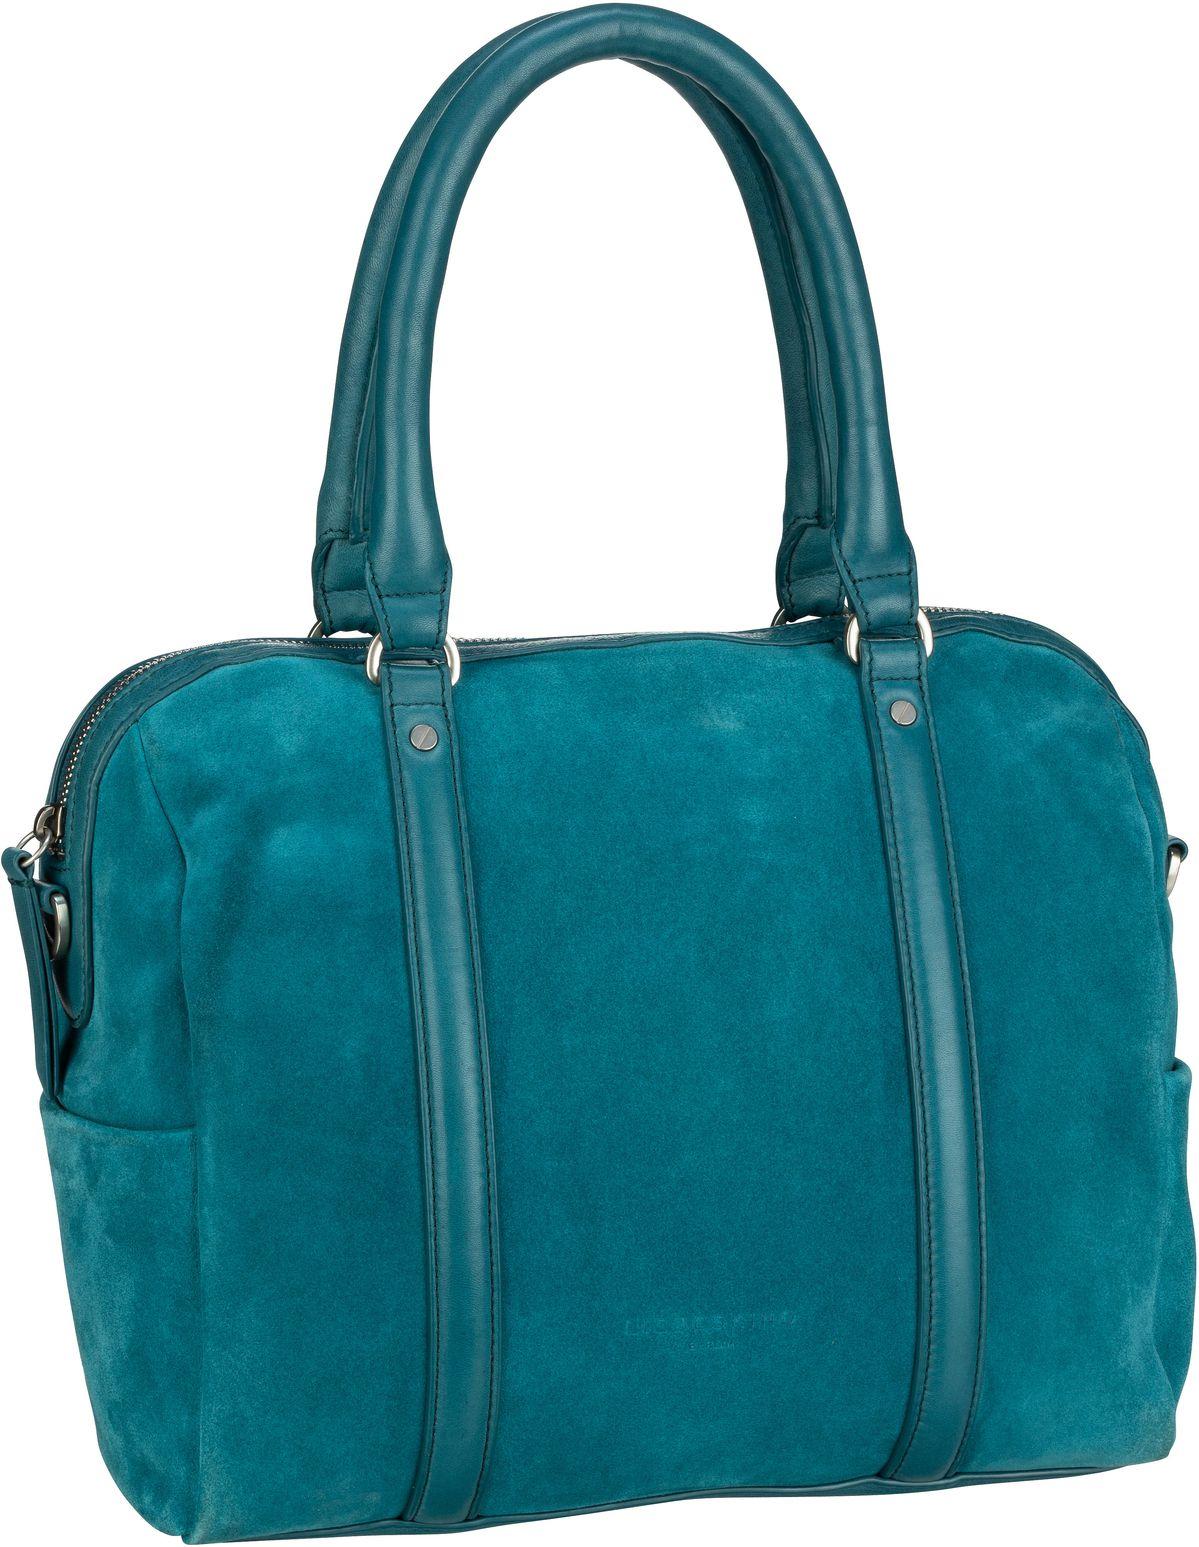 Berlin Handtasche Oak Bowling Bag M Suede Dragonfly Petrol